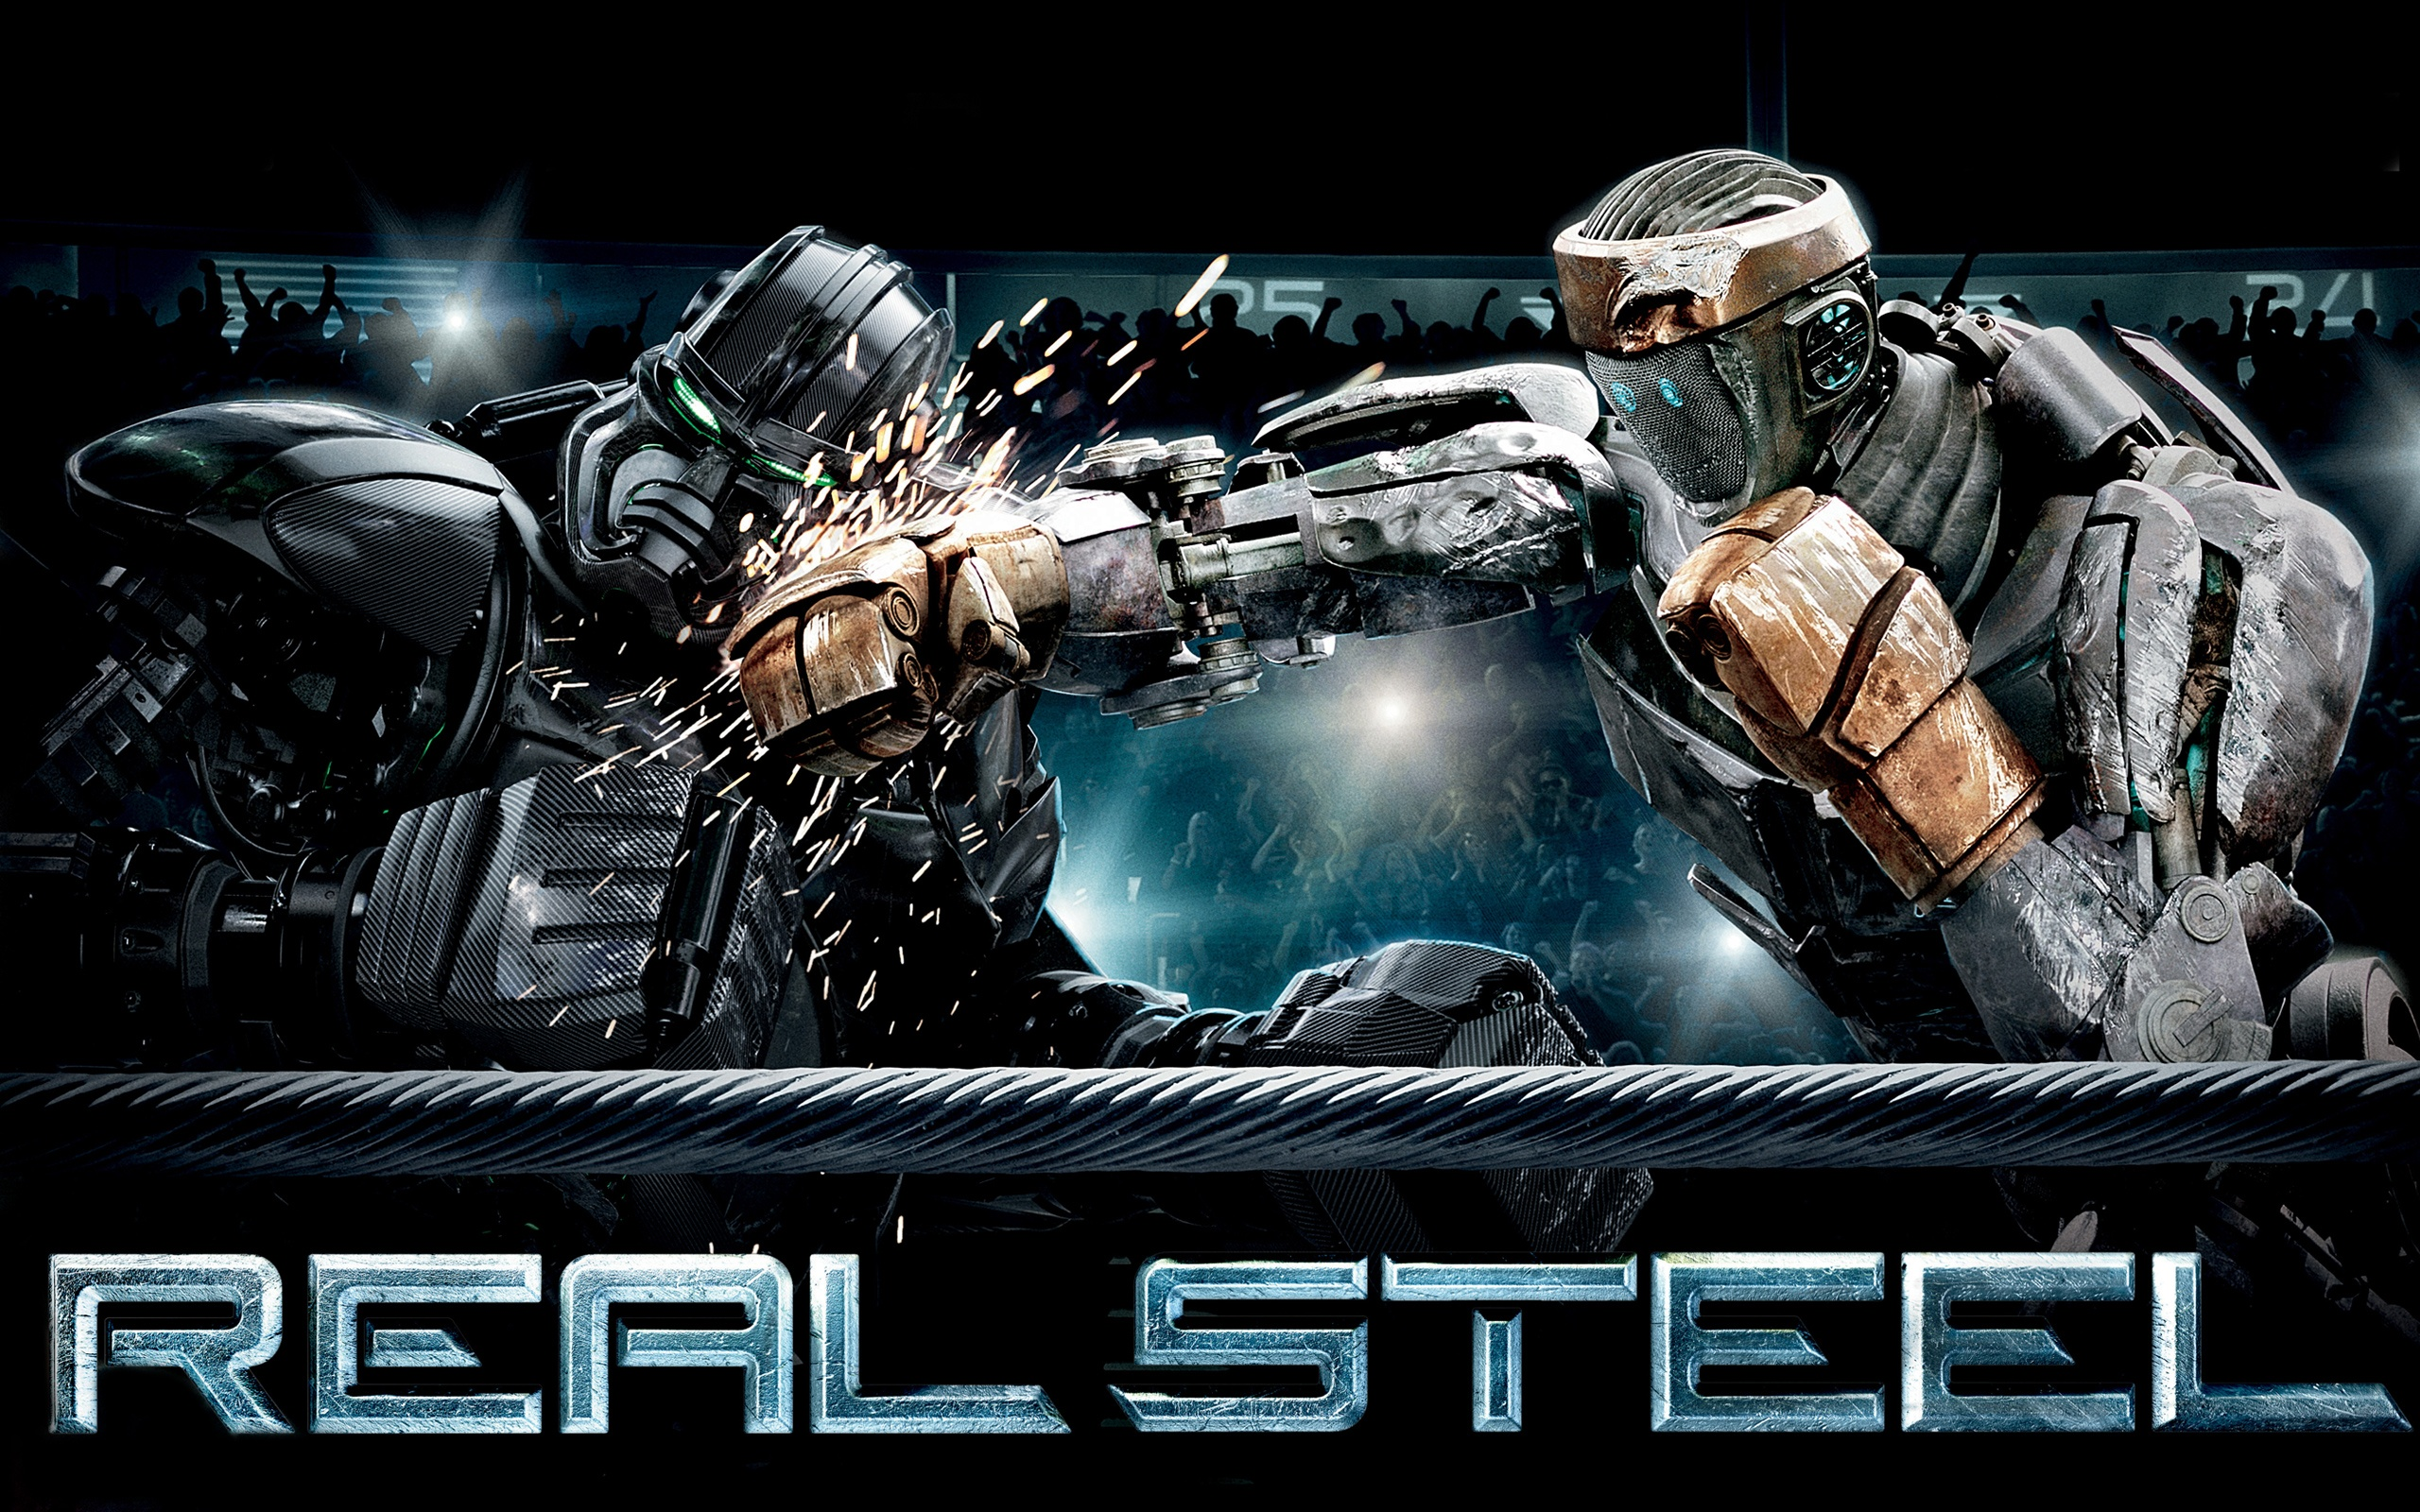 Real Steel Battle Wallpapers HD Wallpapers 2560x1600